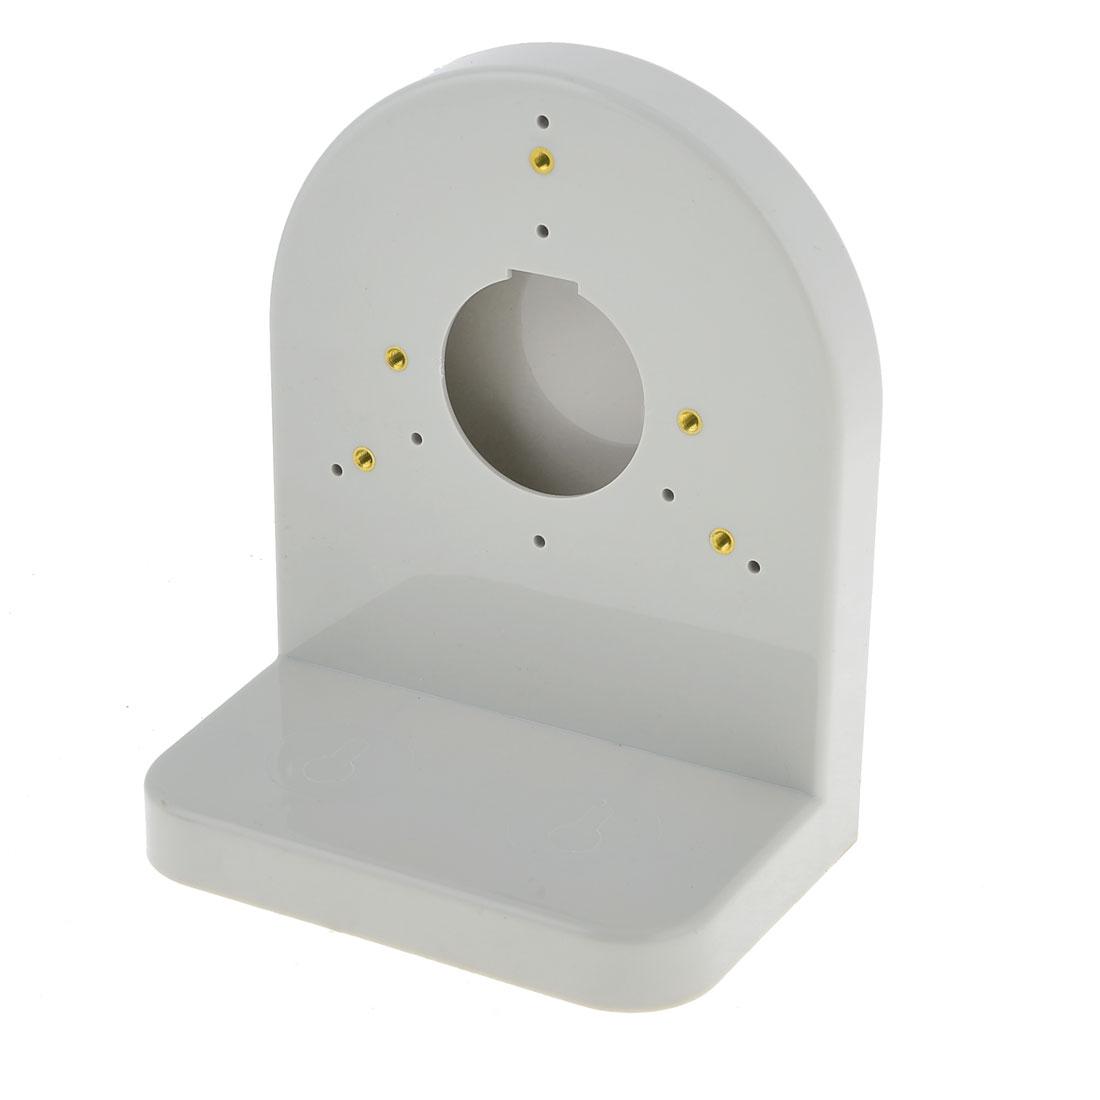 12 Small Hole Gray Plastic L Shape Dome Camera Bracket